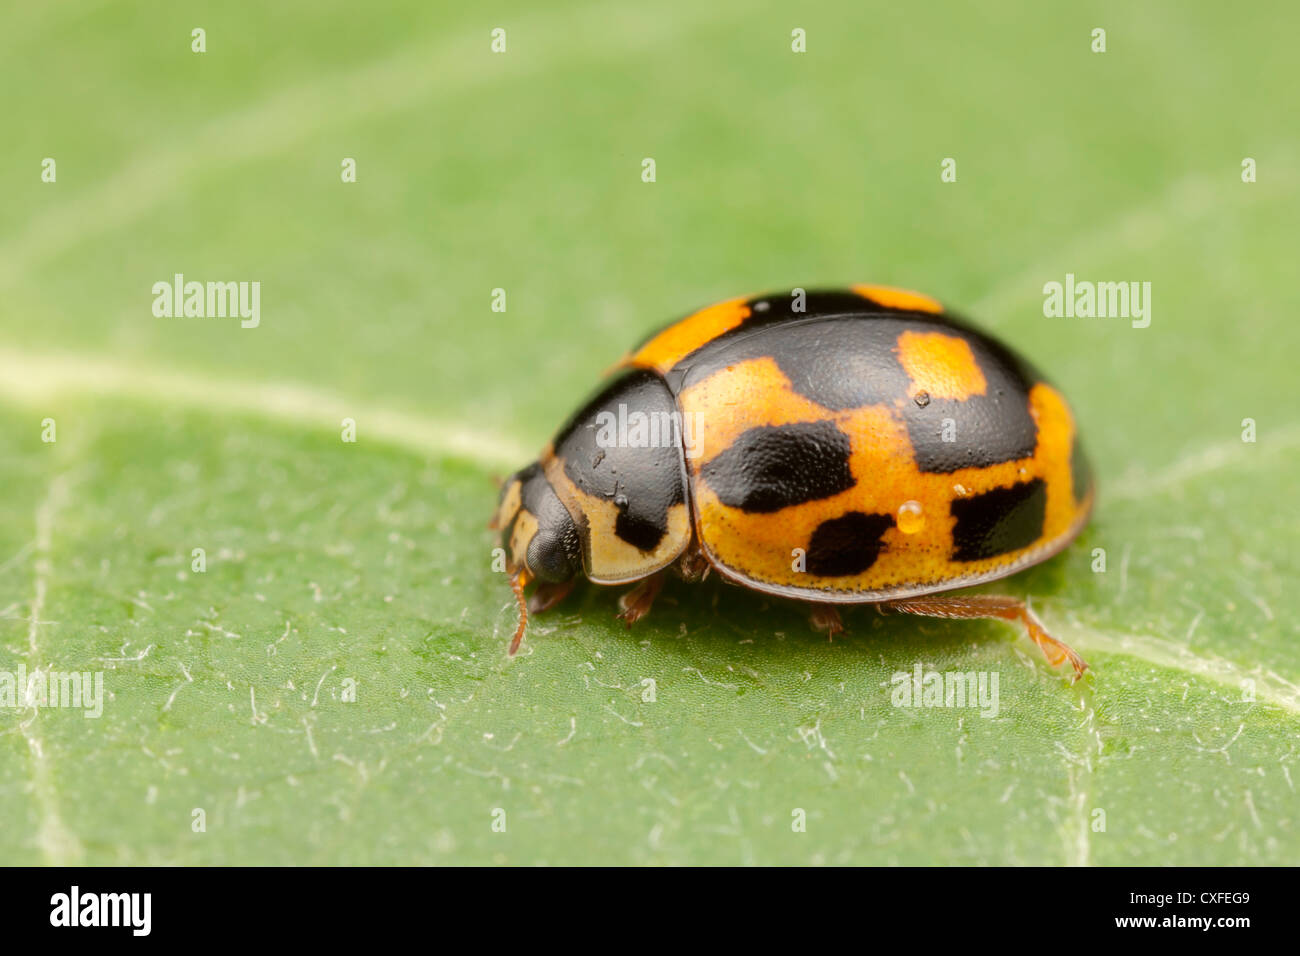 14-spotted Lady Beetle (Propylea quatuordecimpunctata) - Hembra Imagen De Stock